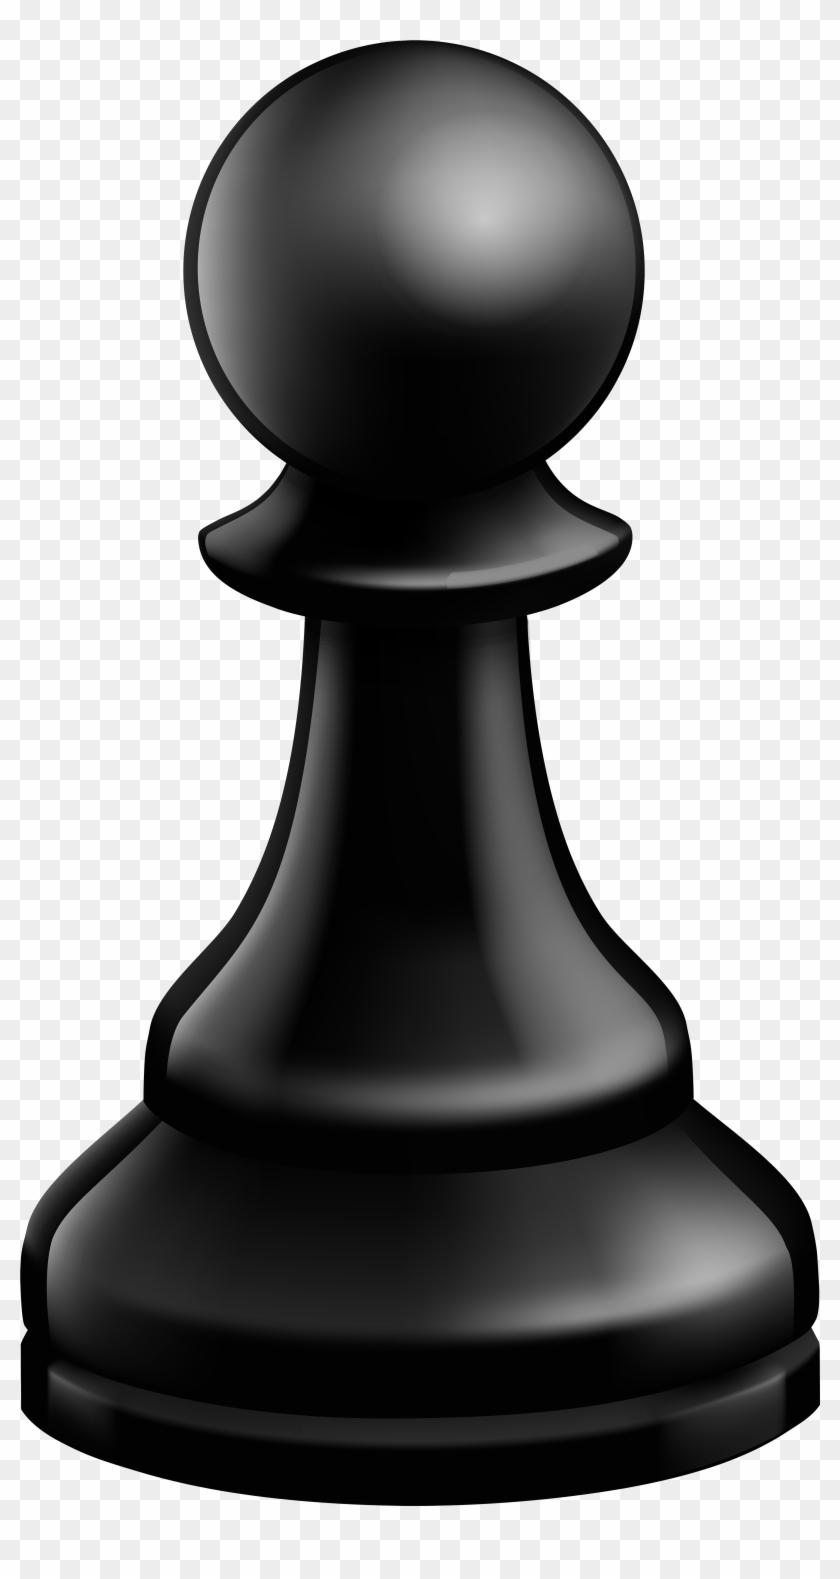 Pawn Black Chess Piece Png Clip Art.